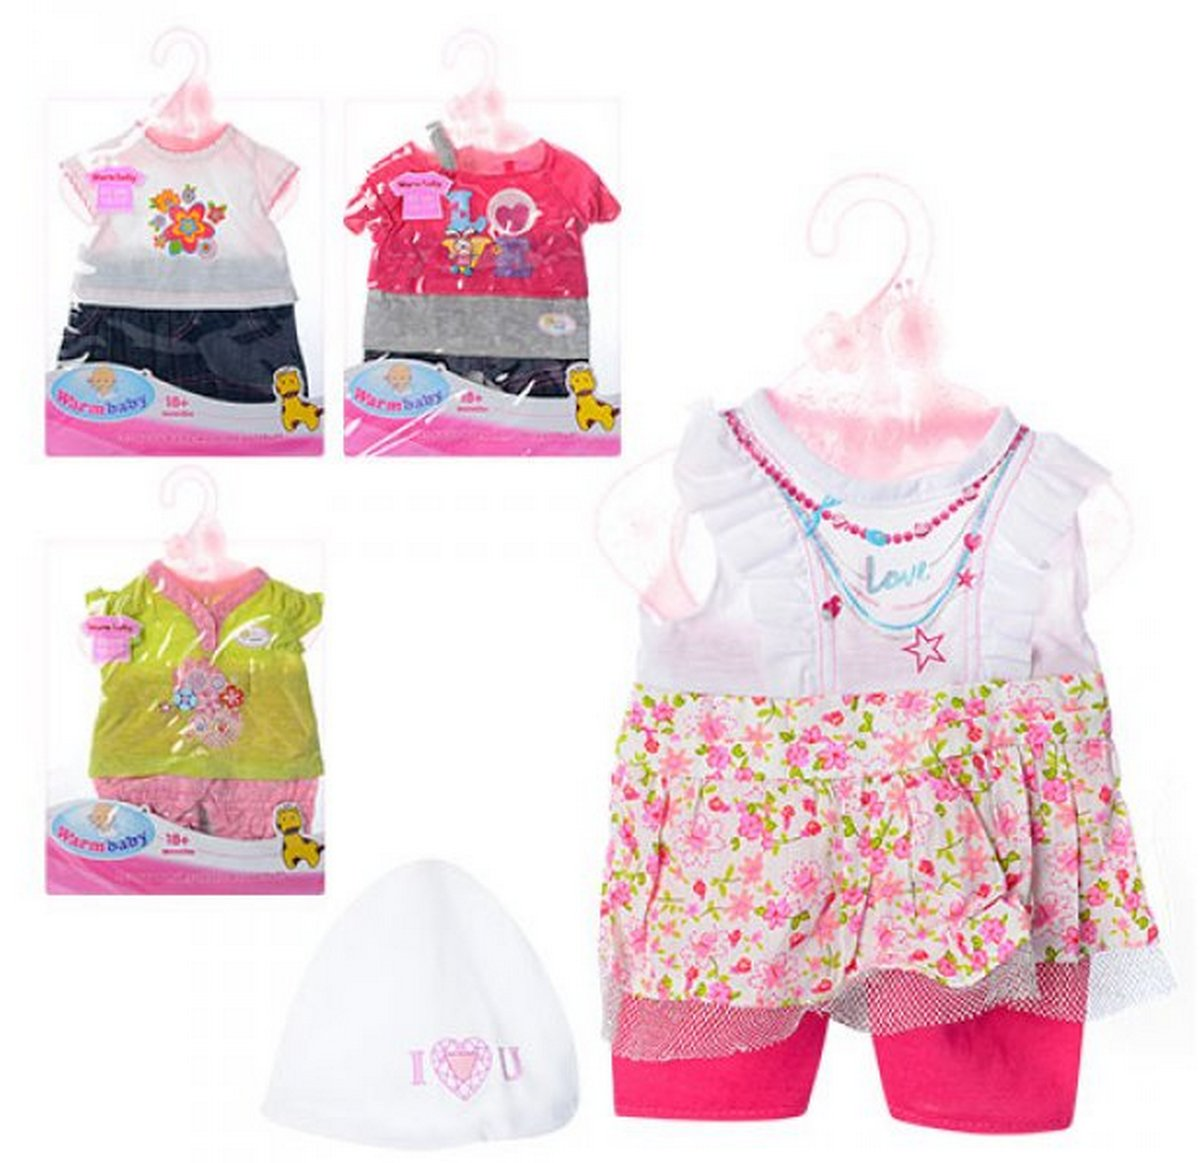 baby doll Наряд для пупса 4 вида DBJ-455-468